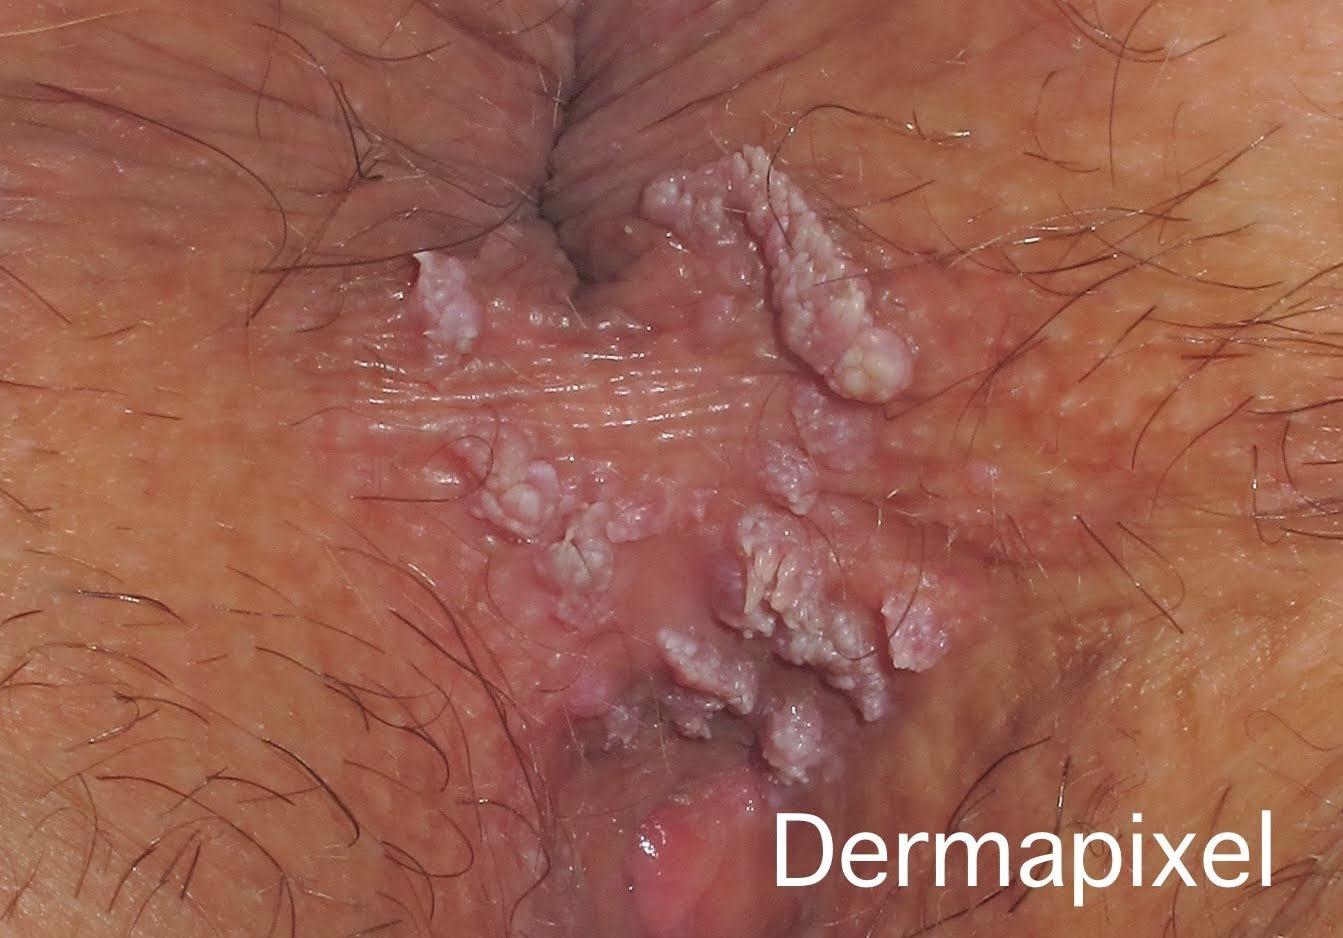 verrugas del papiloma humano en el ano intraductal papilloma images